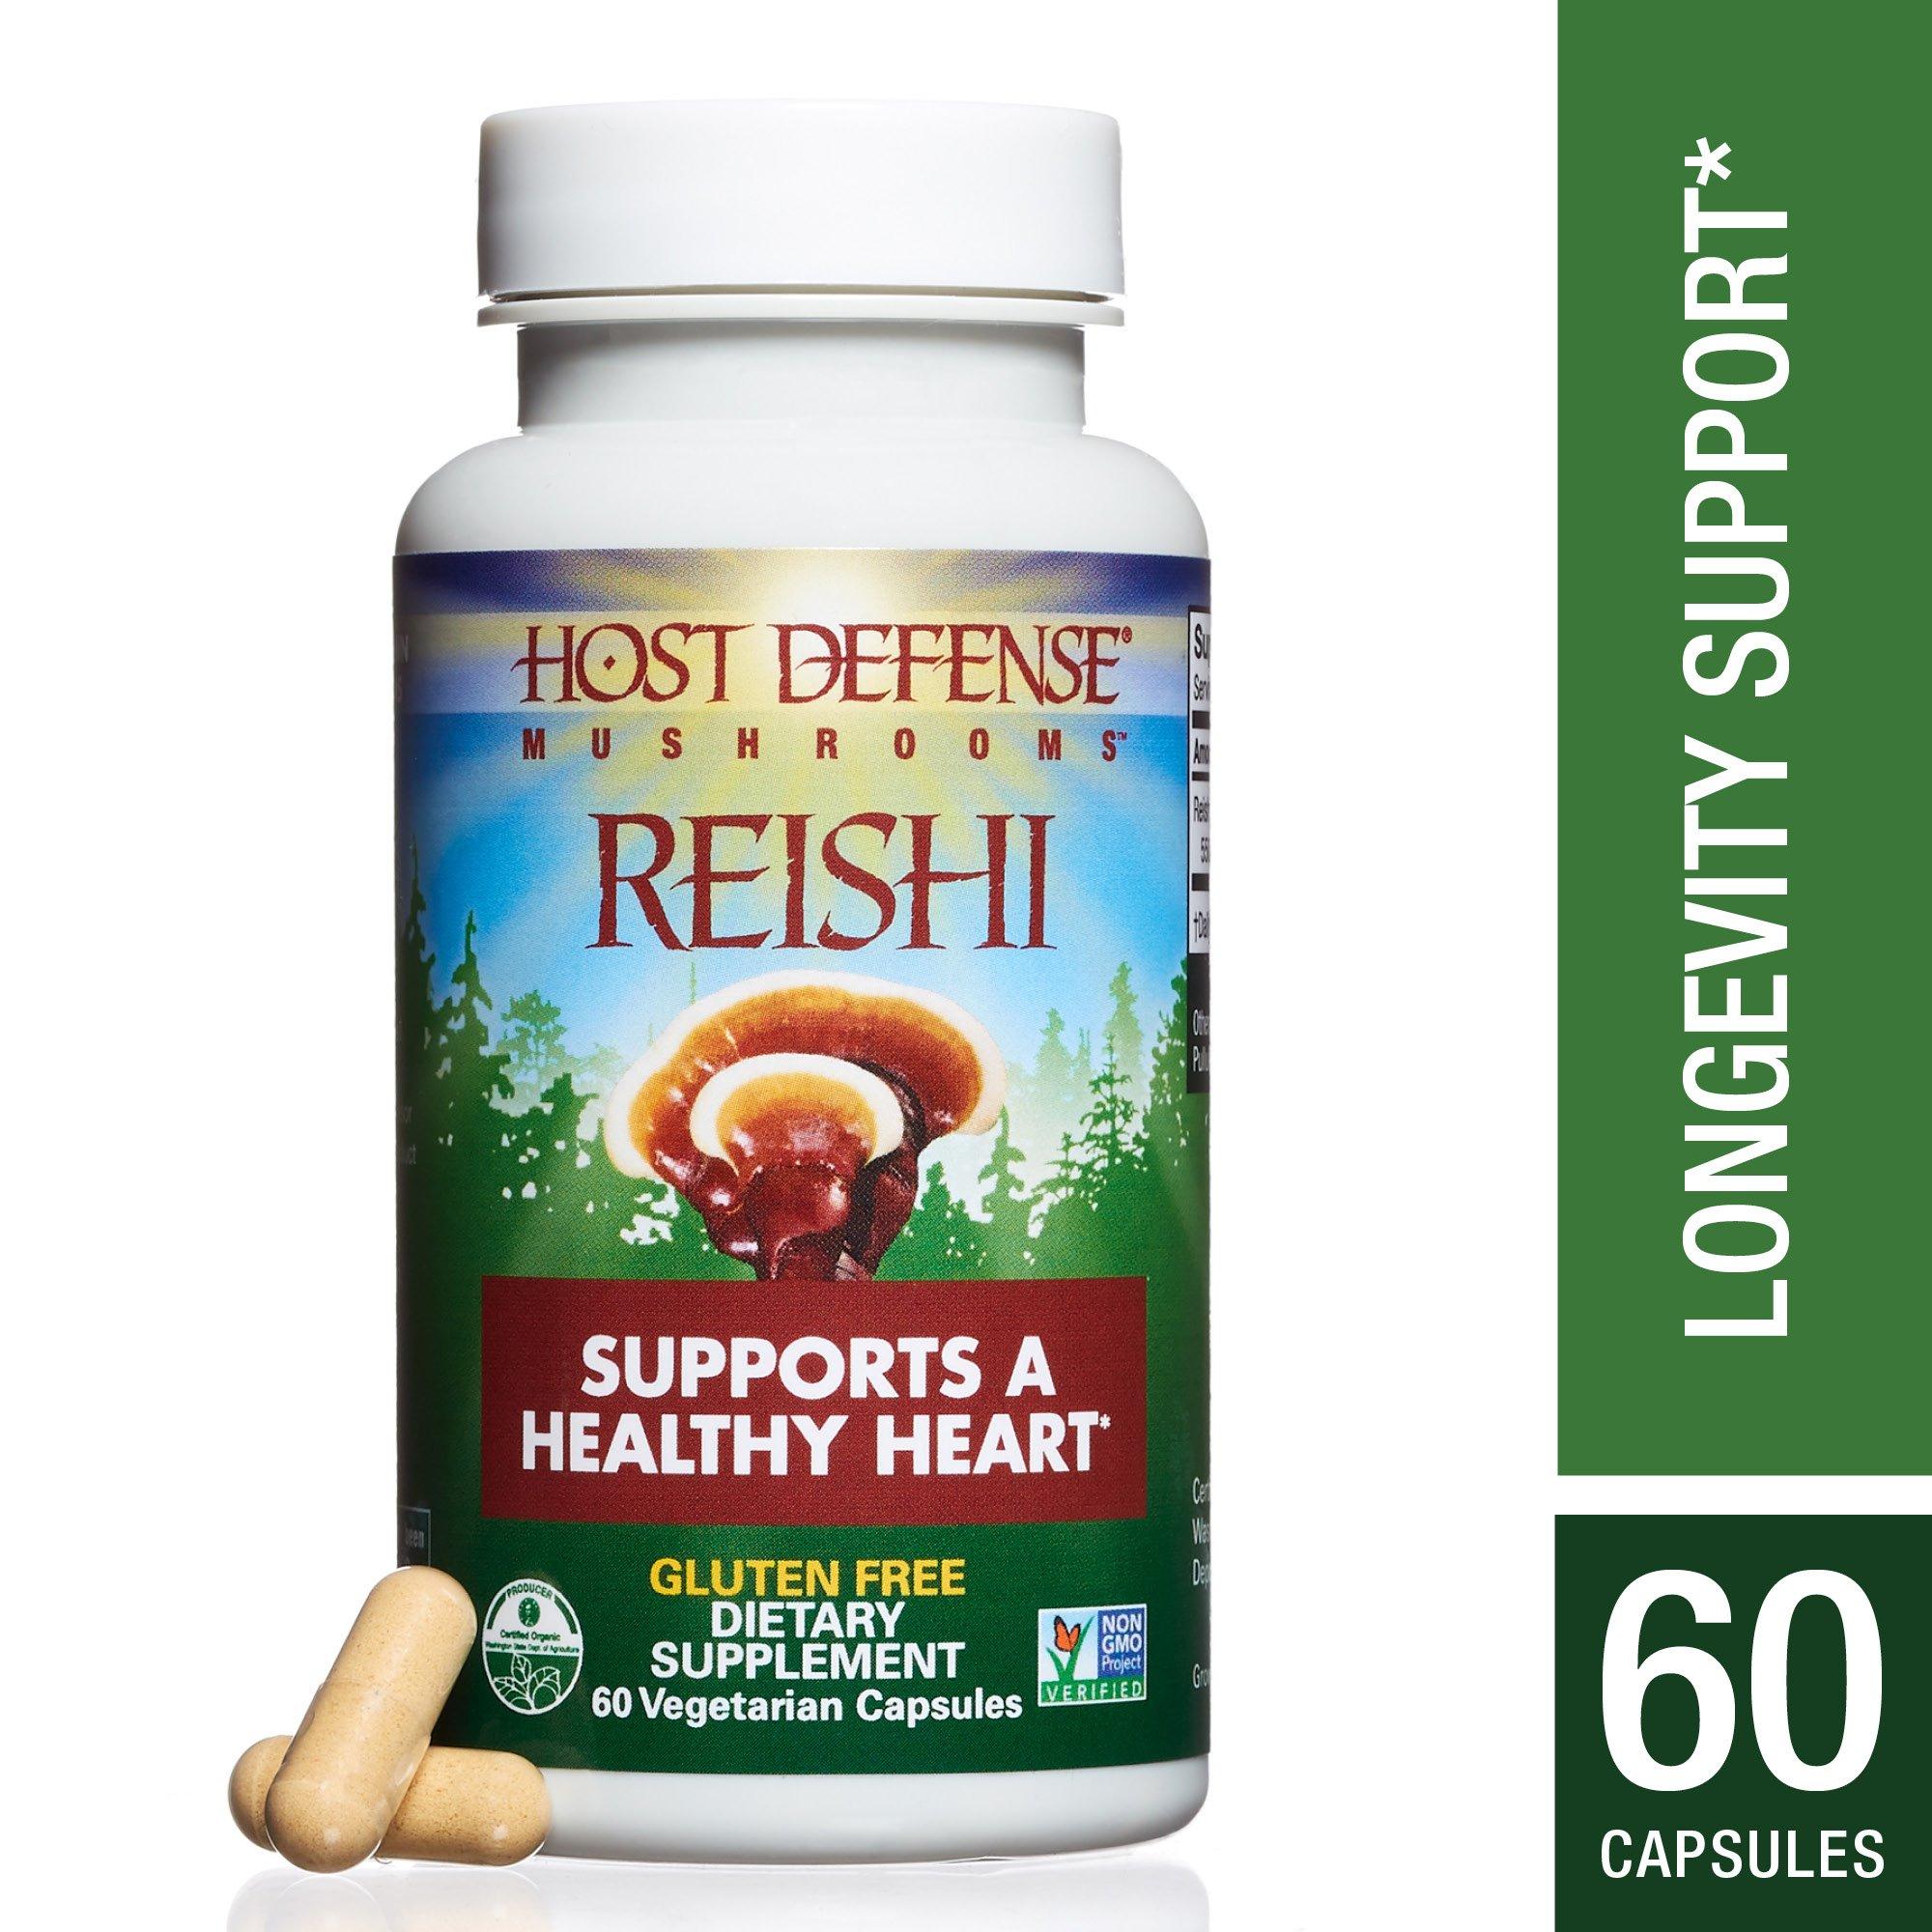 Host Defense - Reishi Capsules, Mushroom Support for Heart Health, 60 Count (FFP)